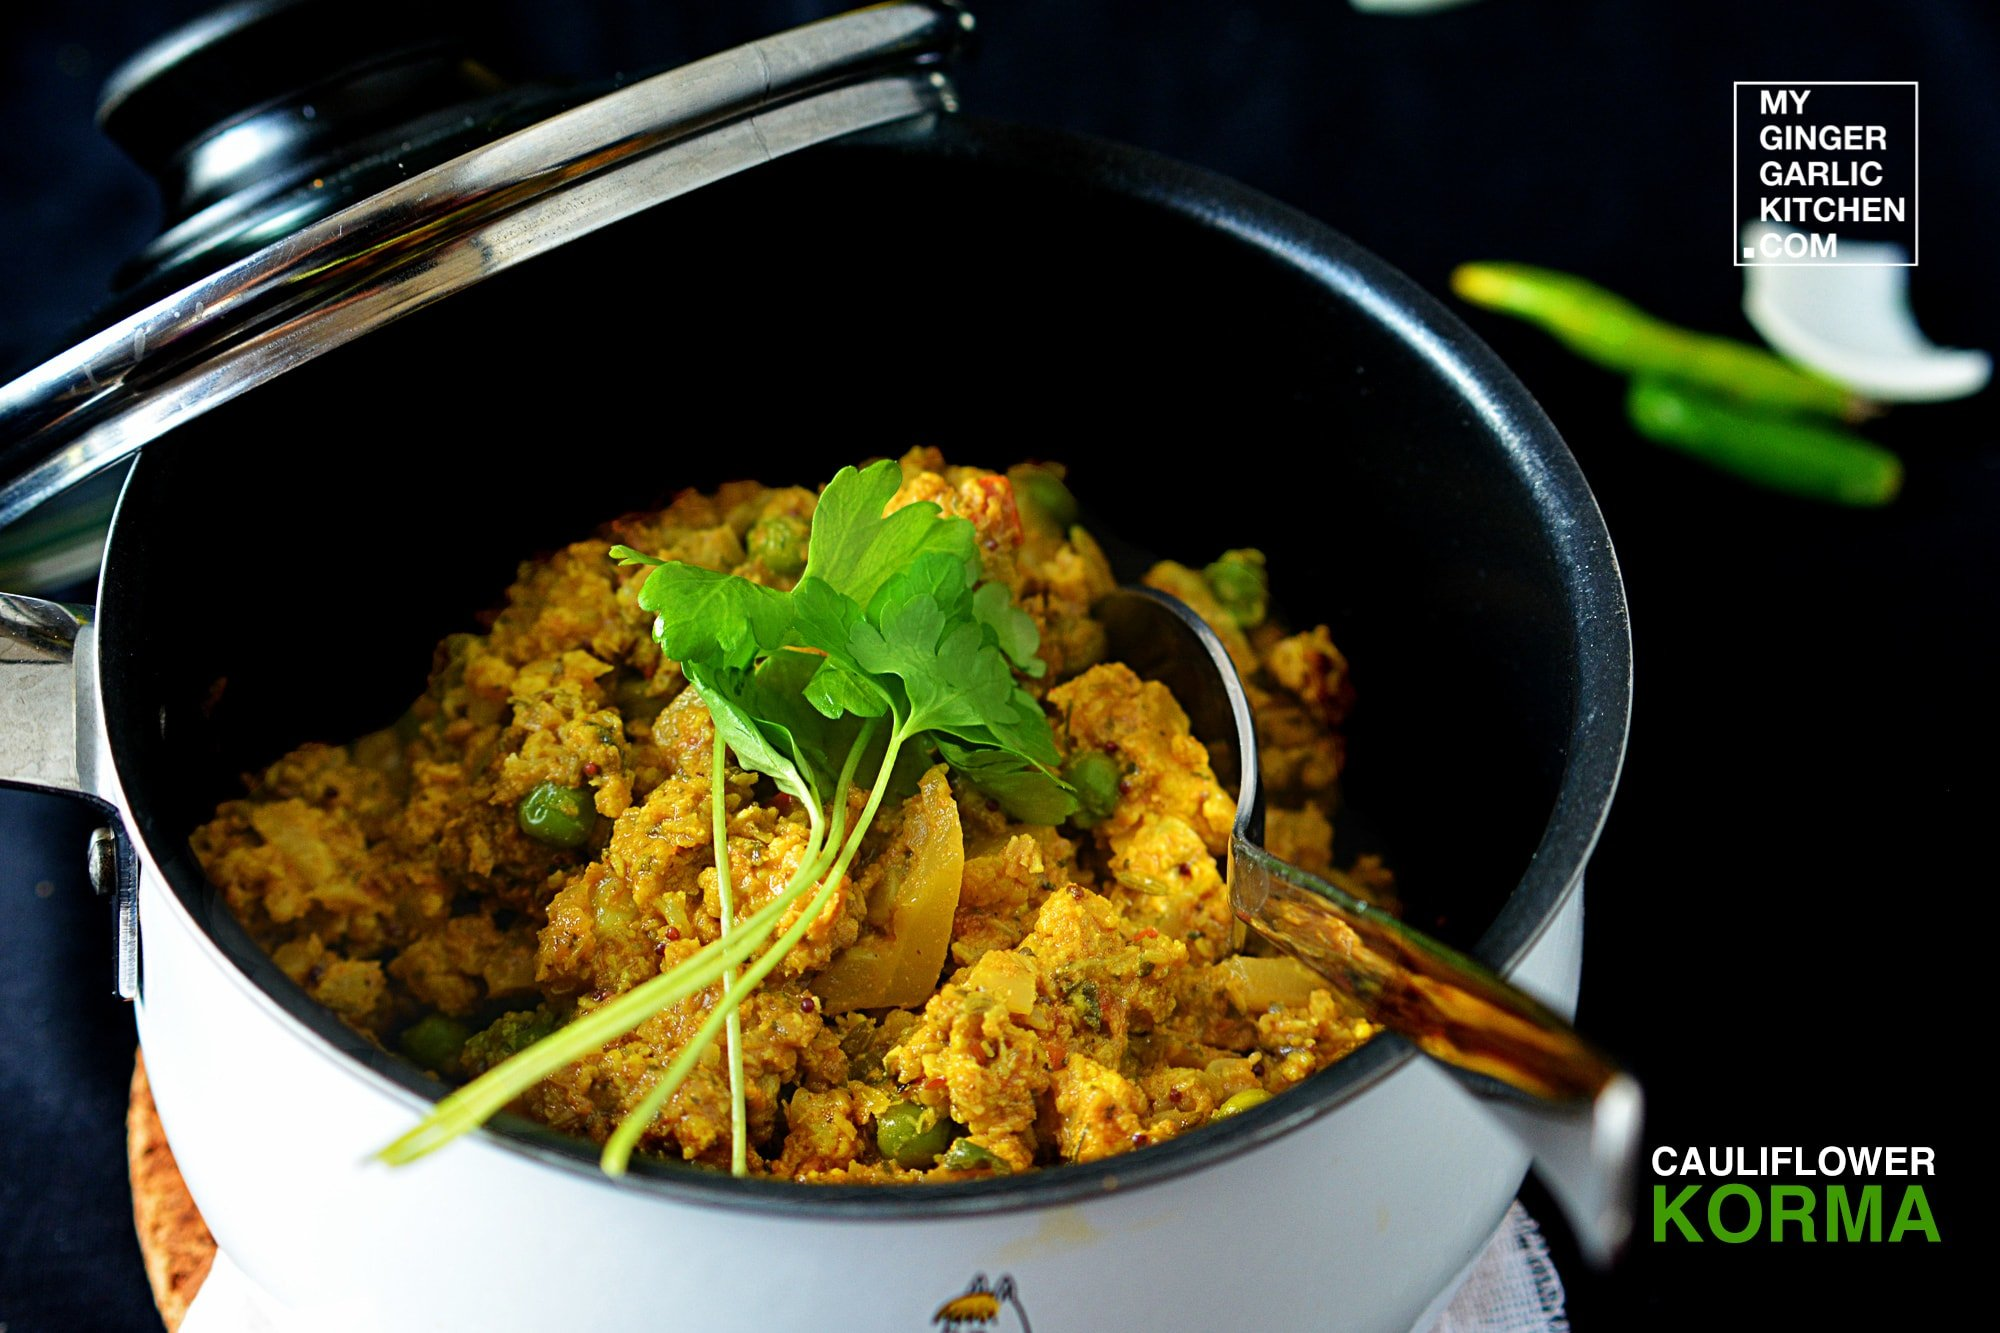 recipe-tantalizing-cauliflower-korma-anupama-paliwal-my-ginger-garlic-kitchen-1